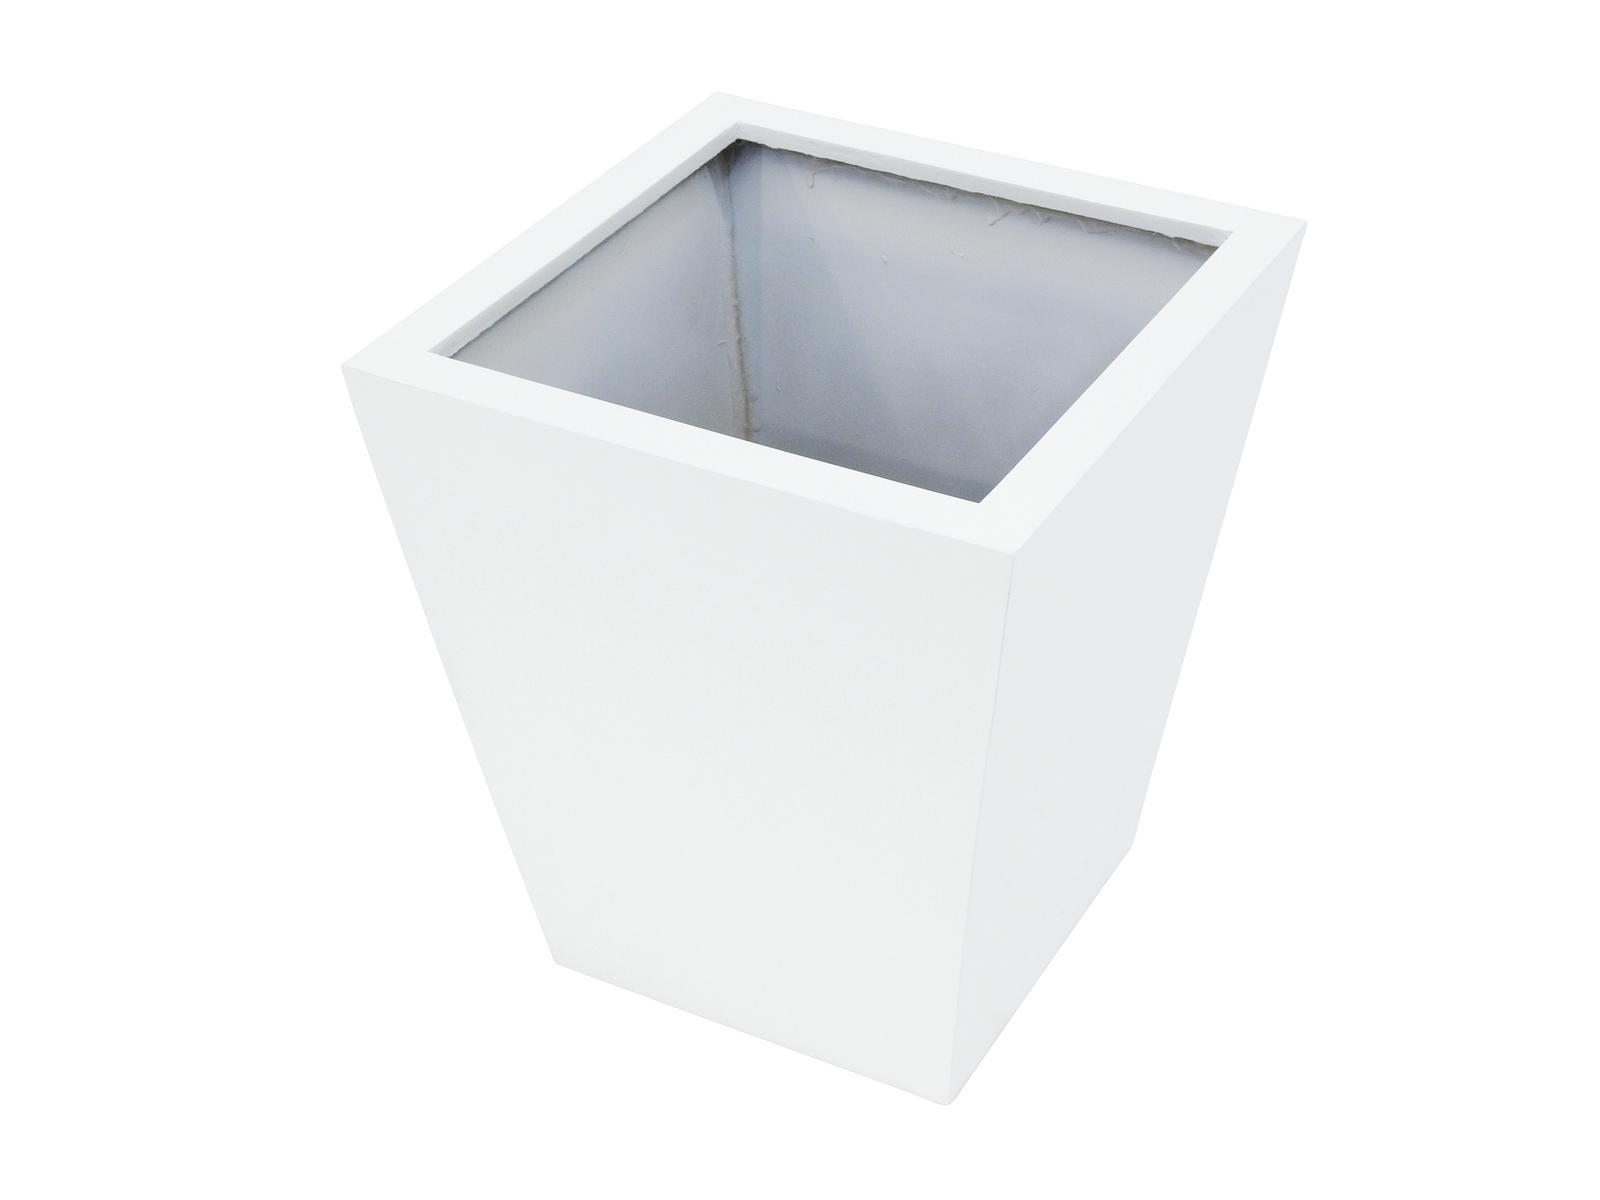 EUROPALMS LEICHTSIN di BASE-50, lucido-bianco